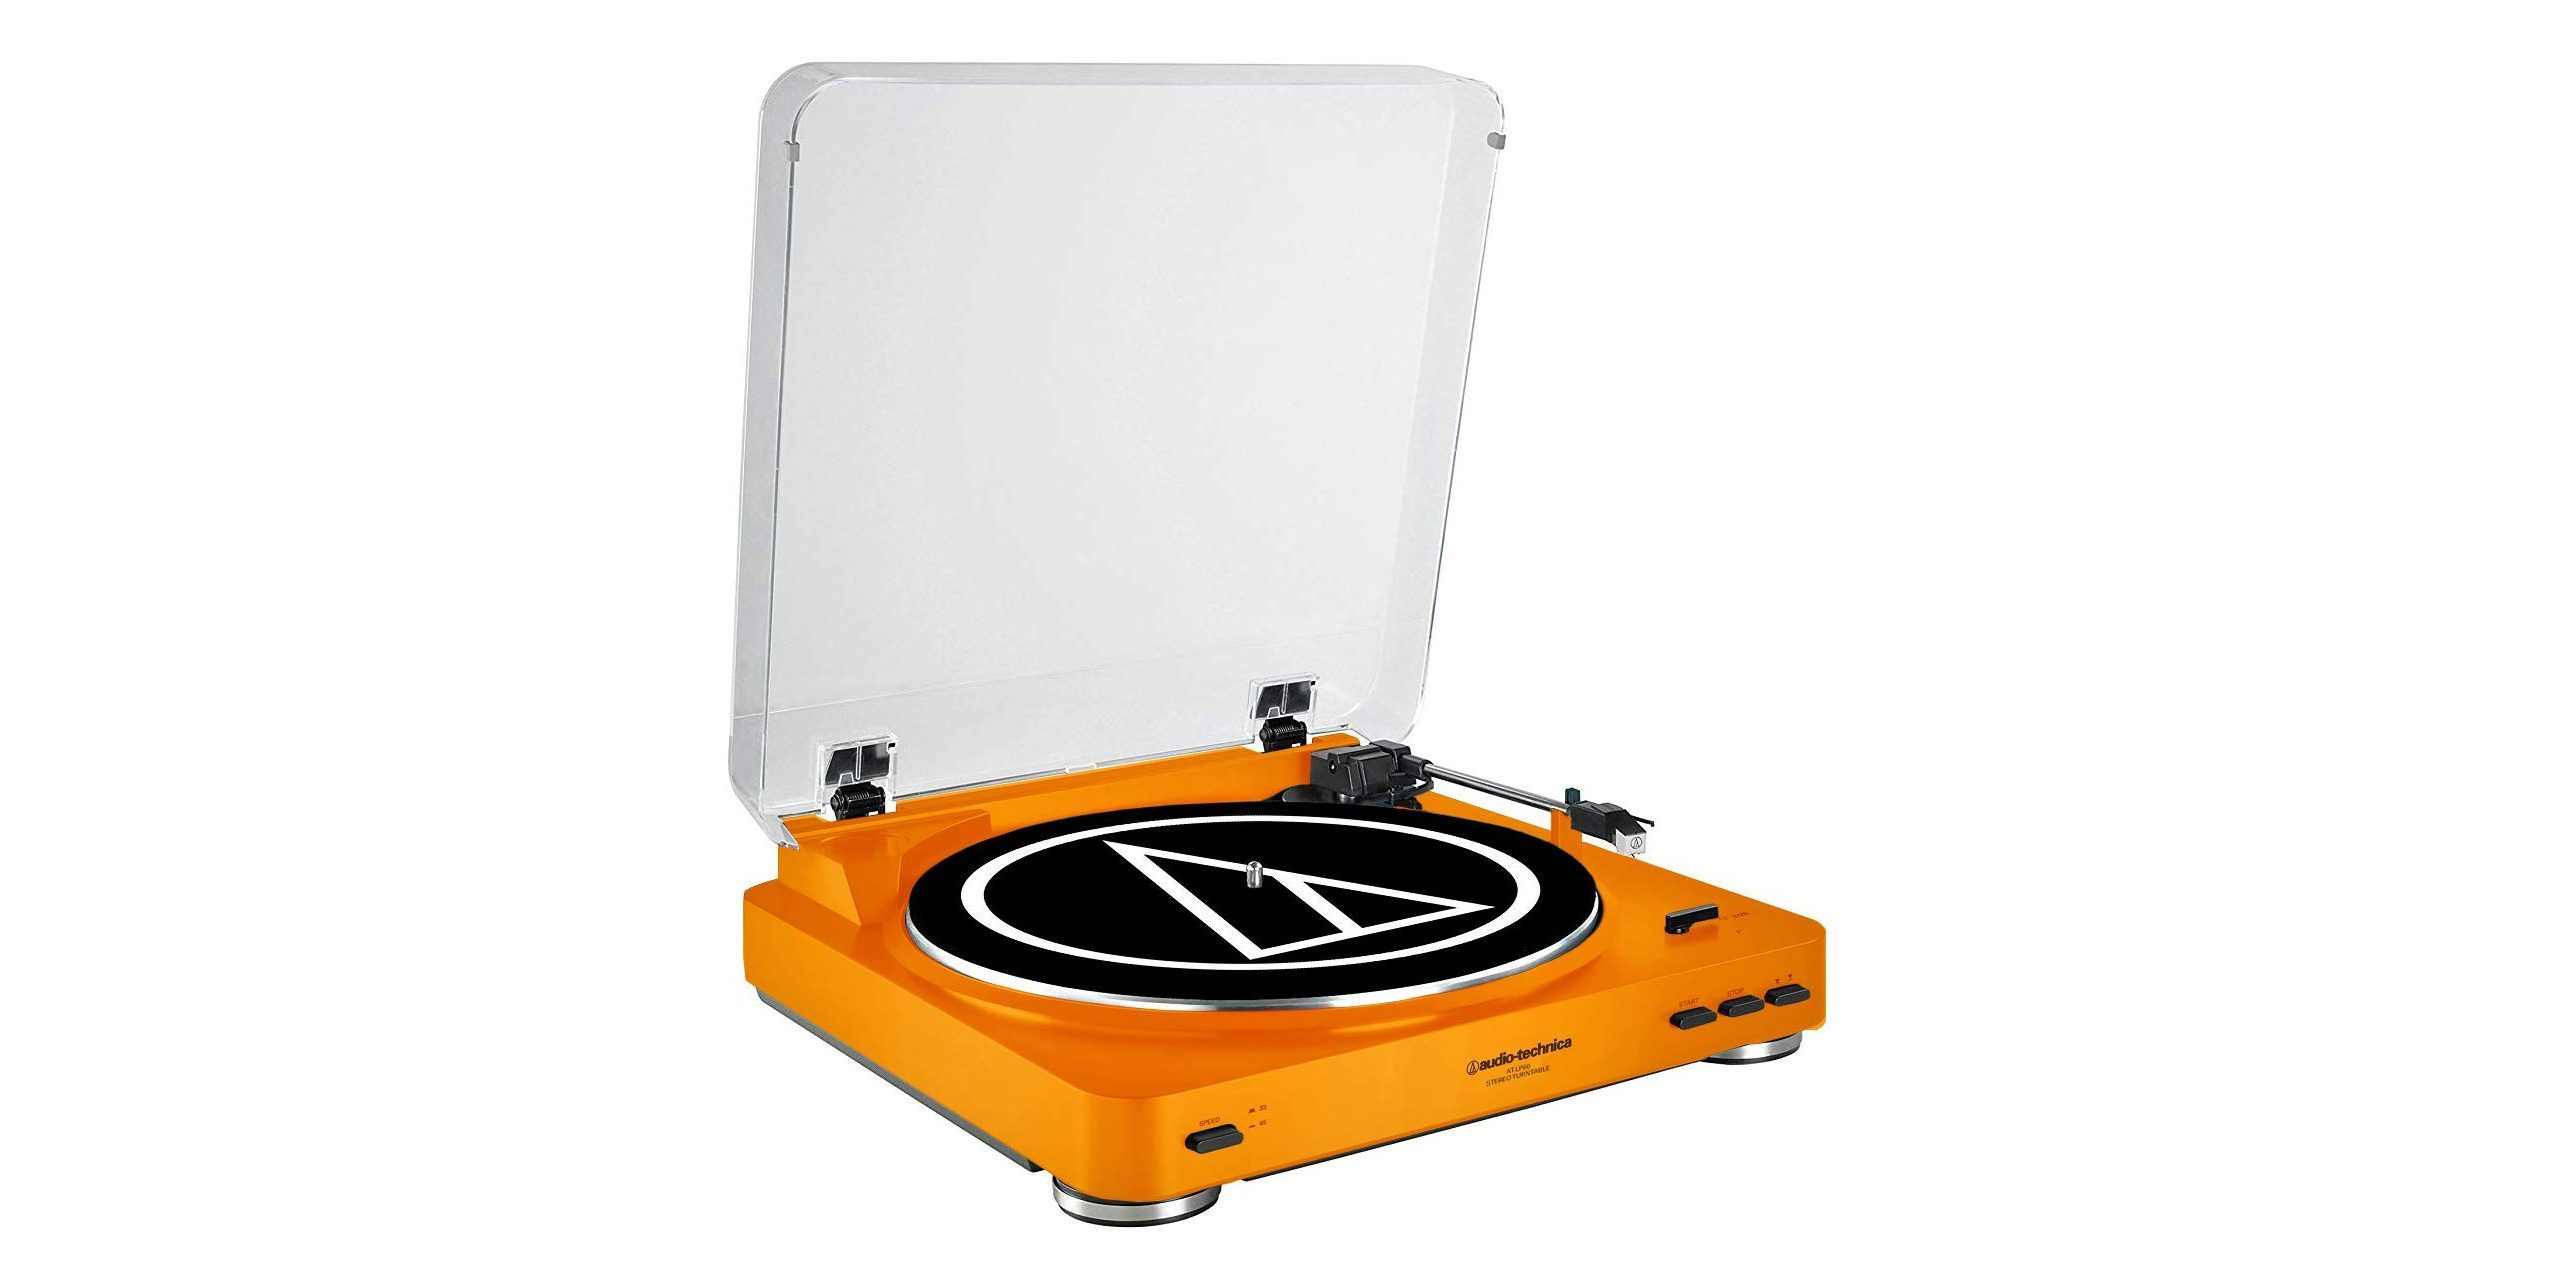 Start your vinyl journey with Audio-Technica's popular turntable for $79 (Reg. $99)